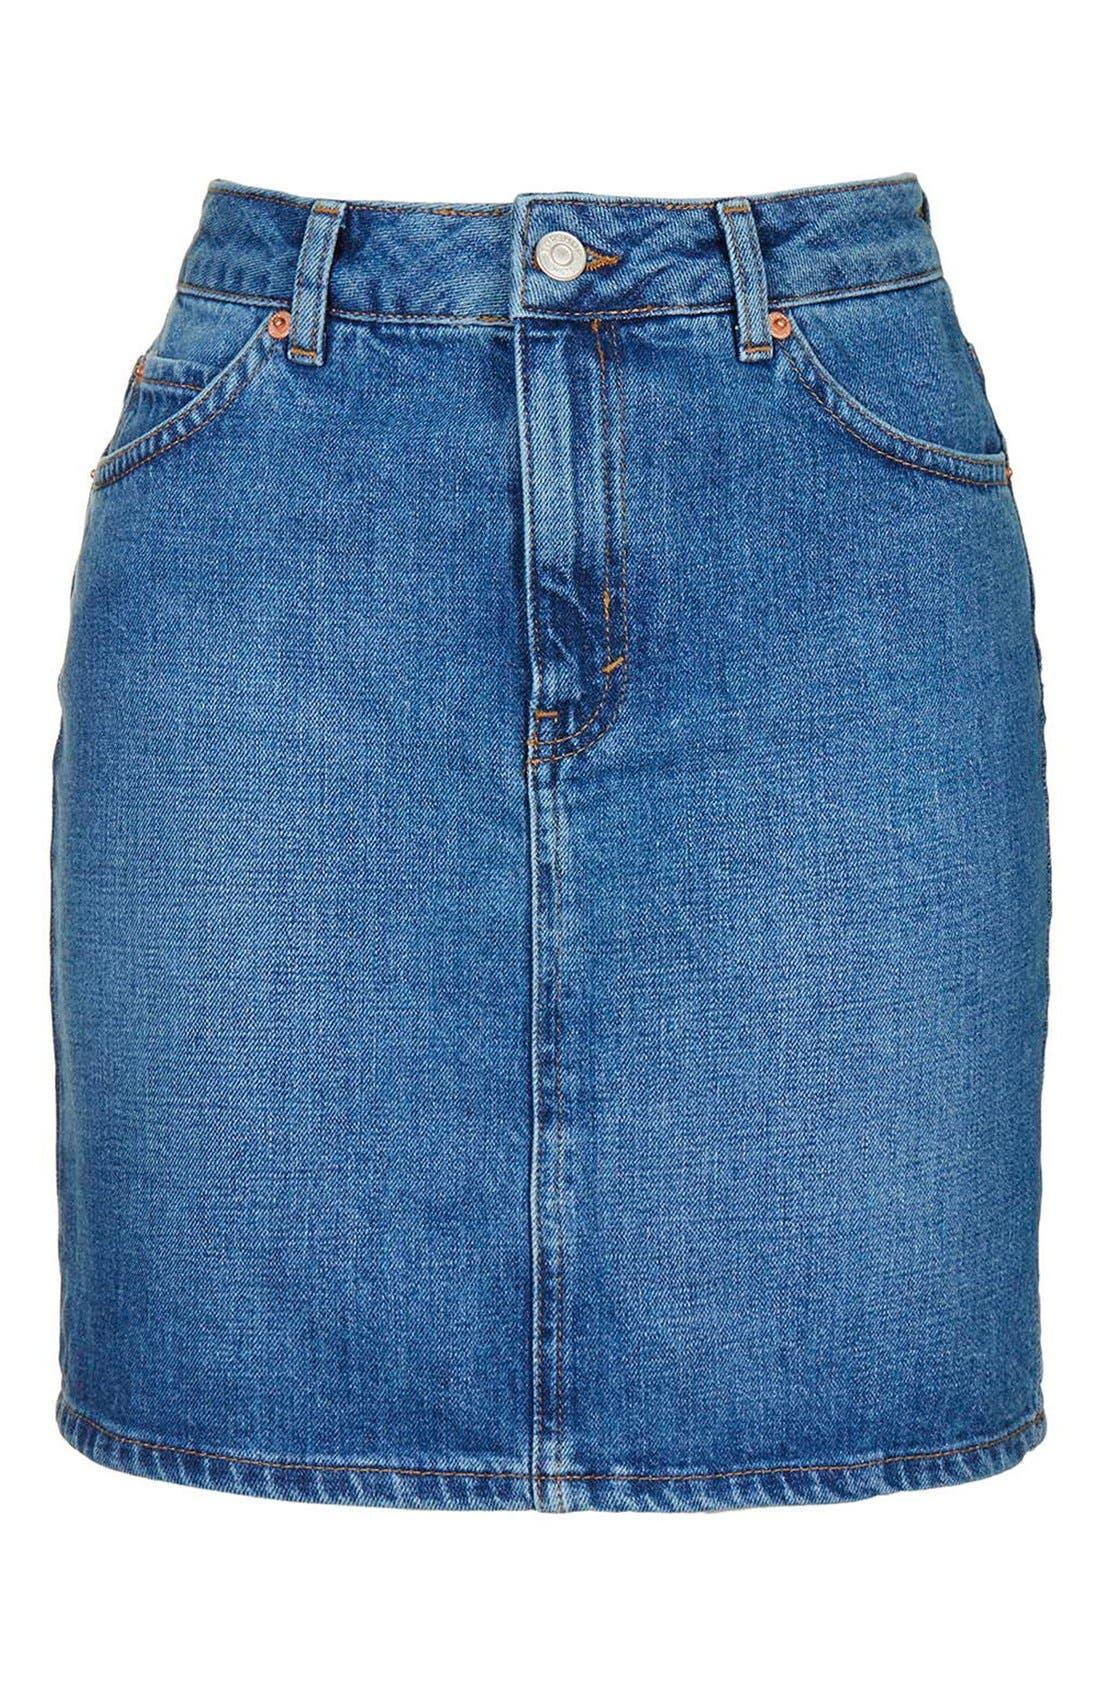 Alternate Image 5  - Topshop High Waist Denim Miniskirt